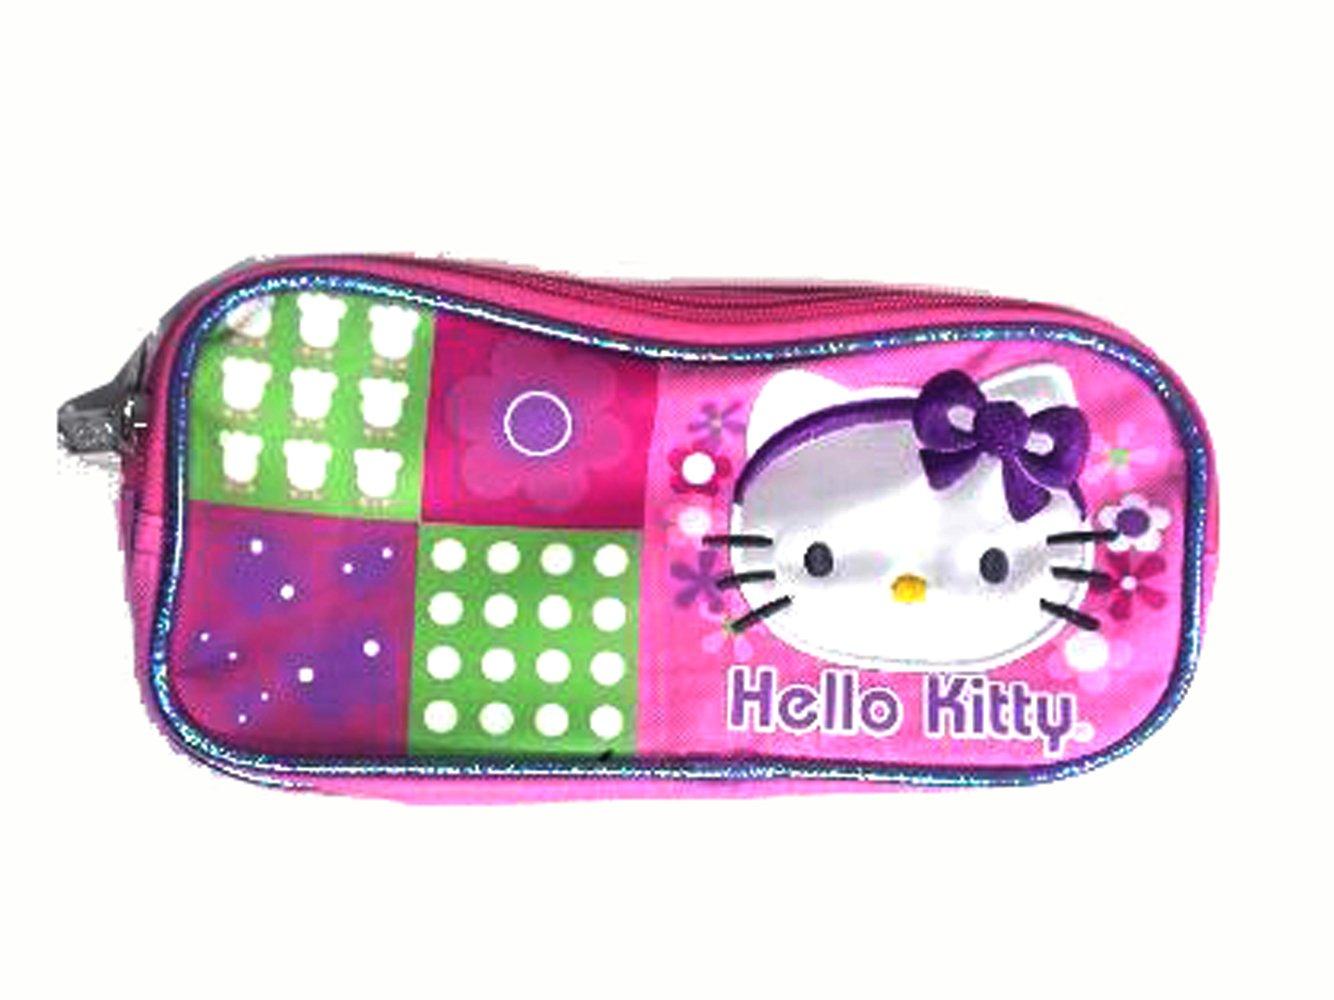 f48c866b5 Pink and Purple Hello Kitty Headband Cosmetic Bag - Hello Kitty Pencil Bag:  Amazon.co.uk: Toys & Games